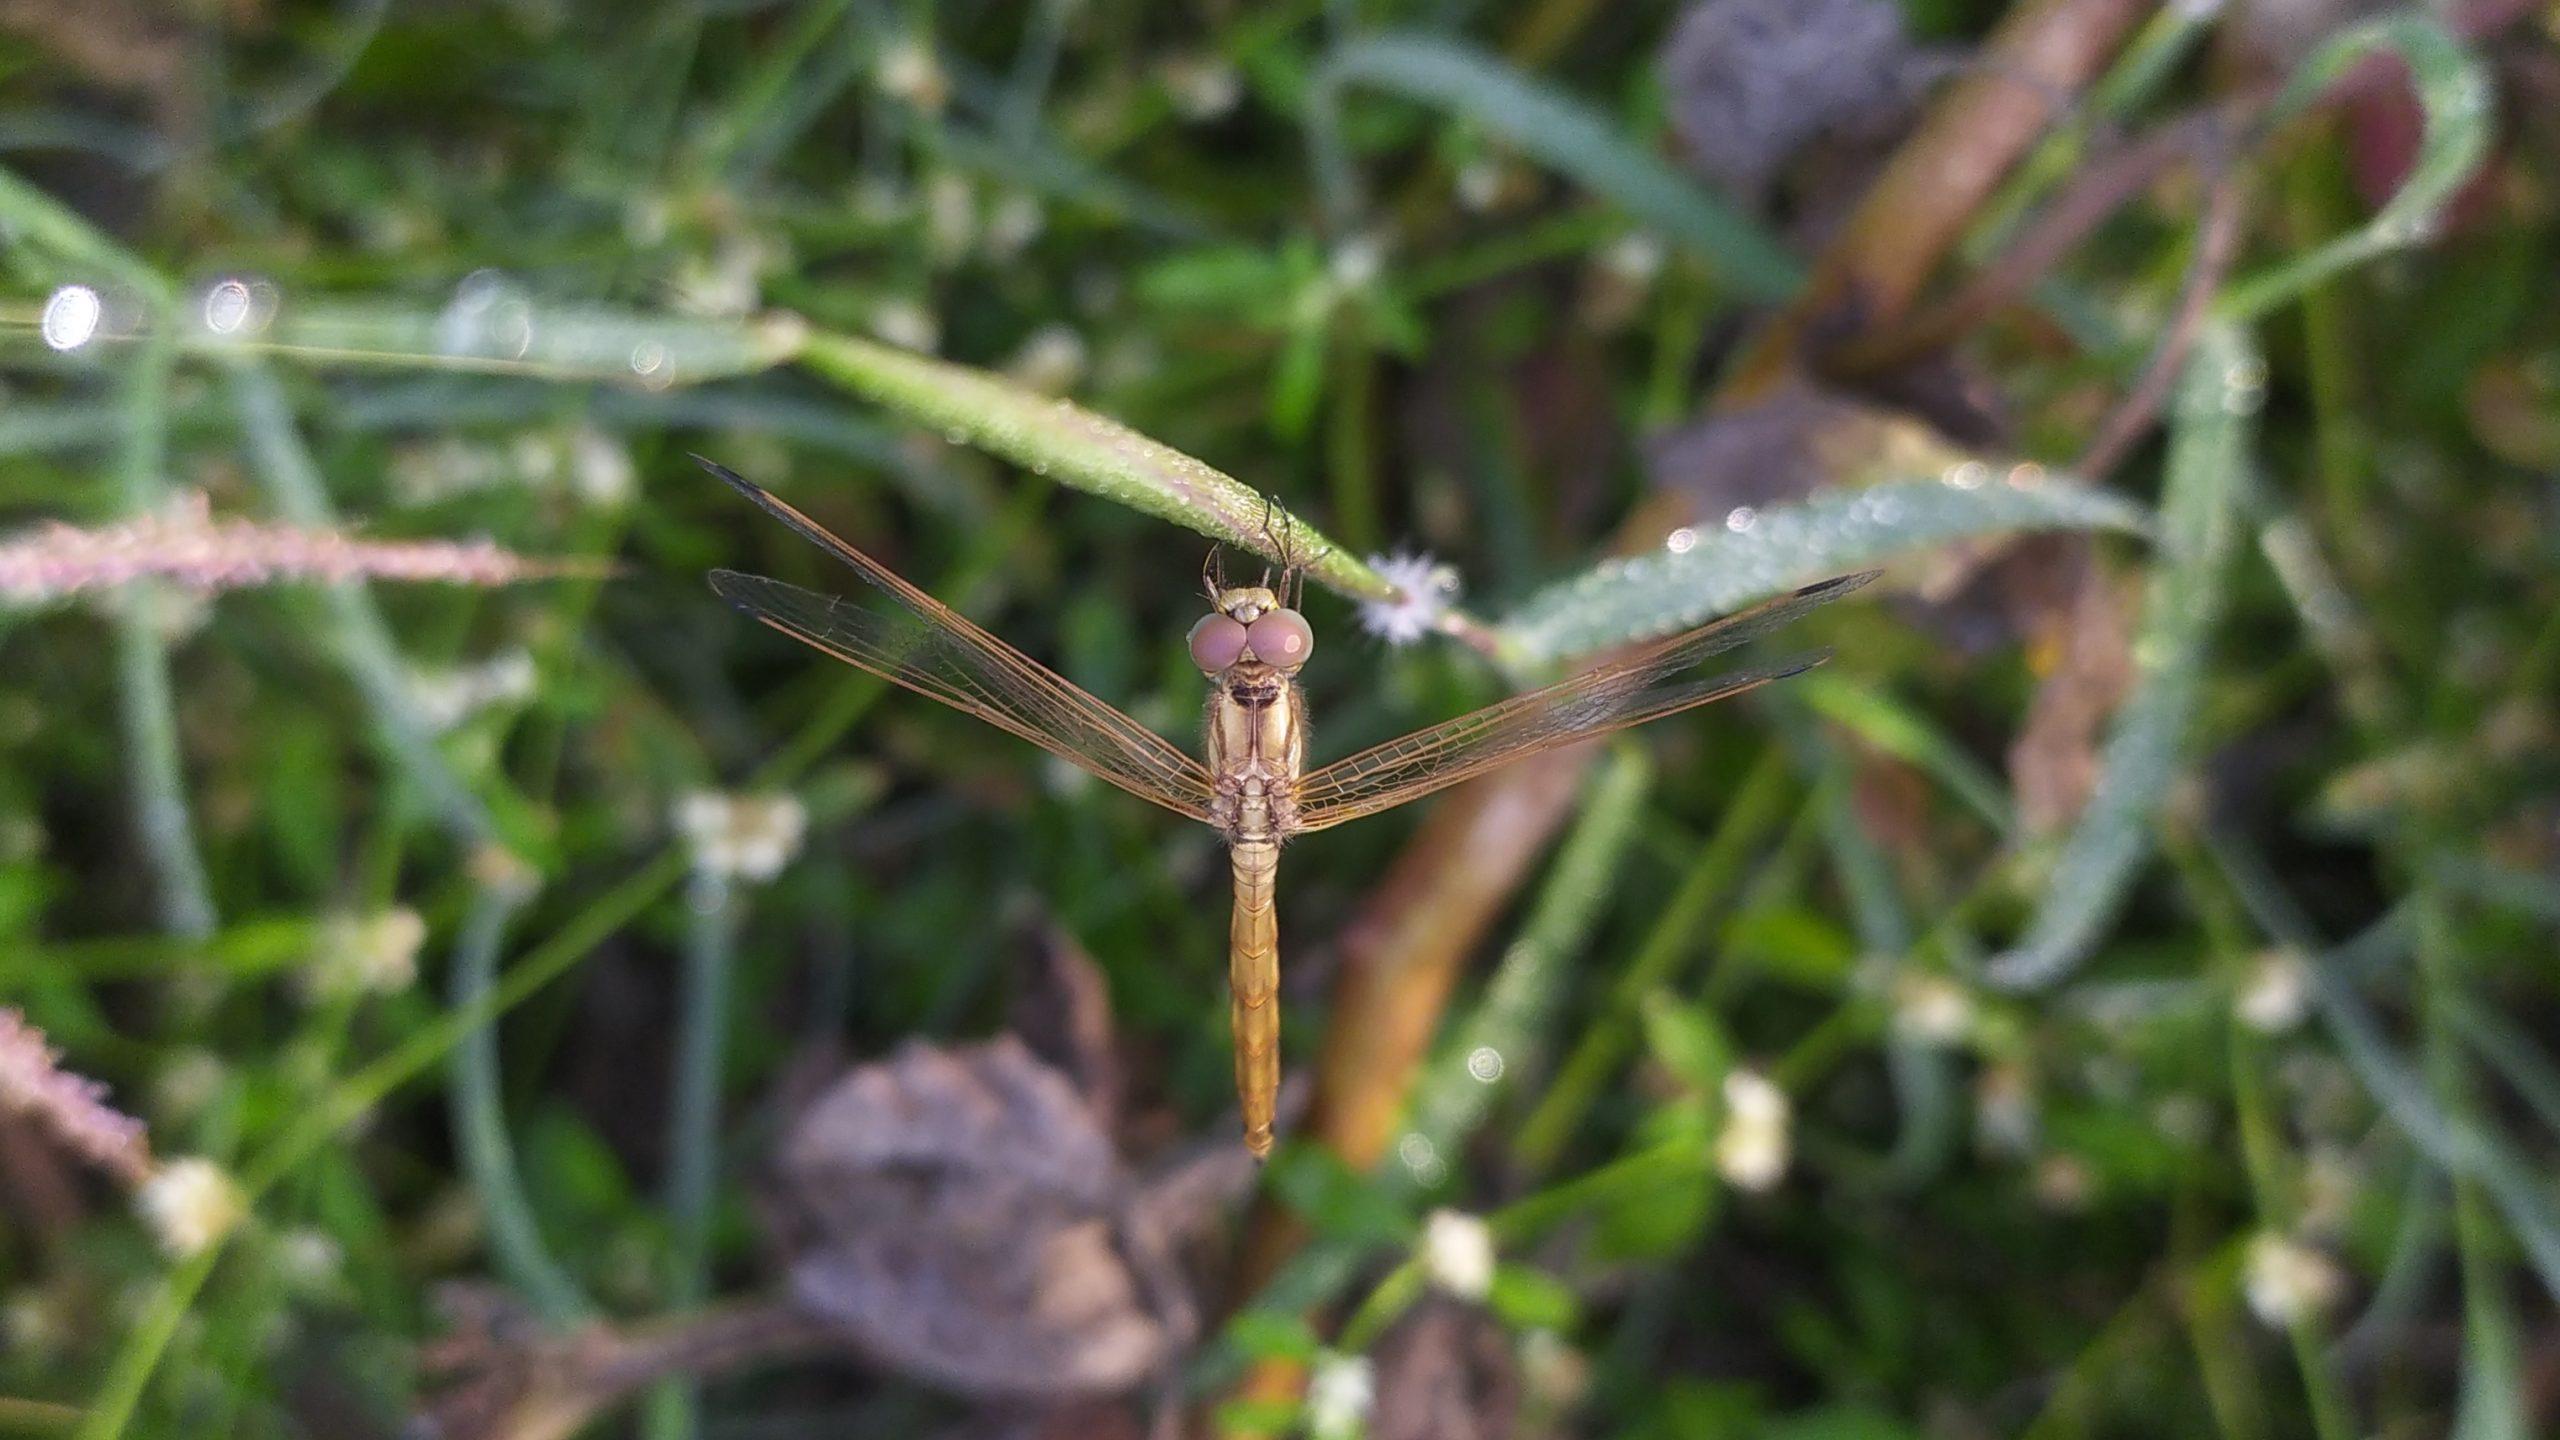 dragonfly on a stem